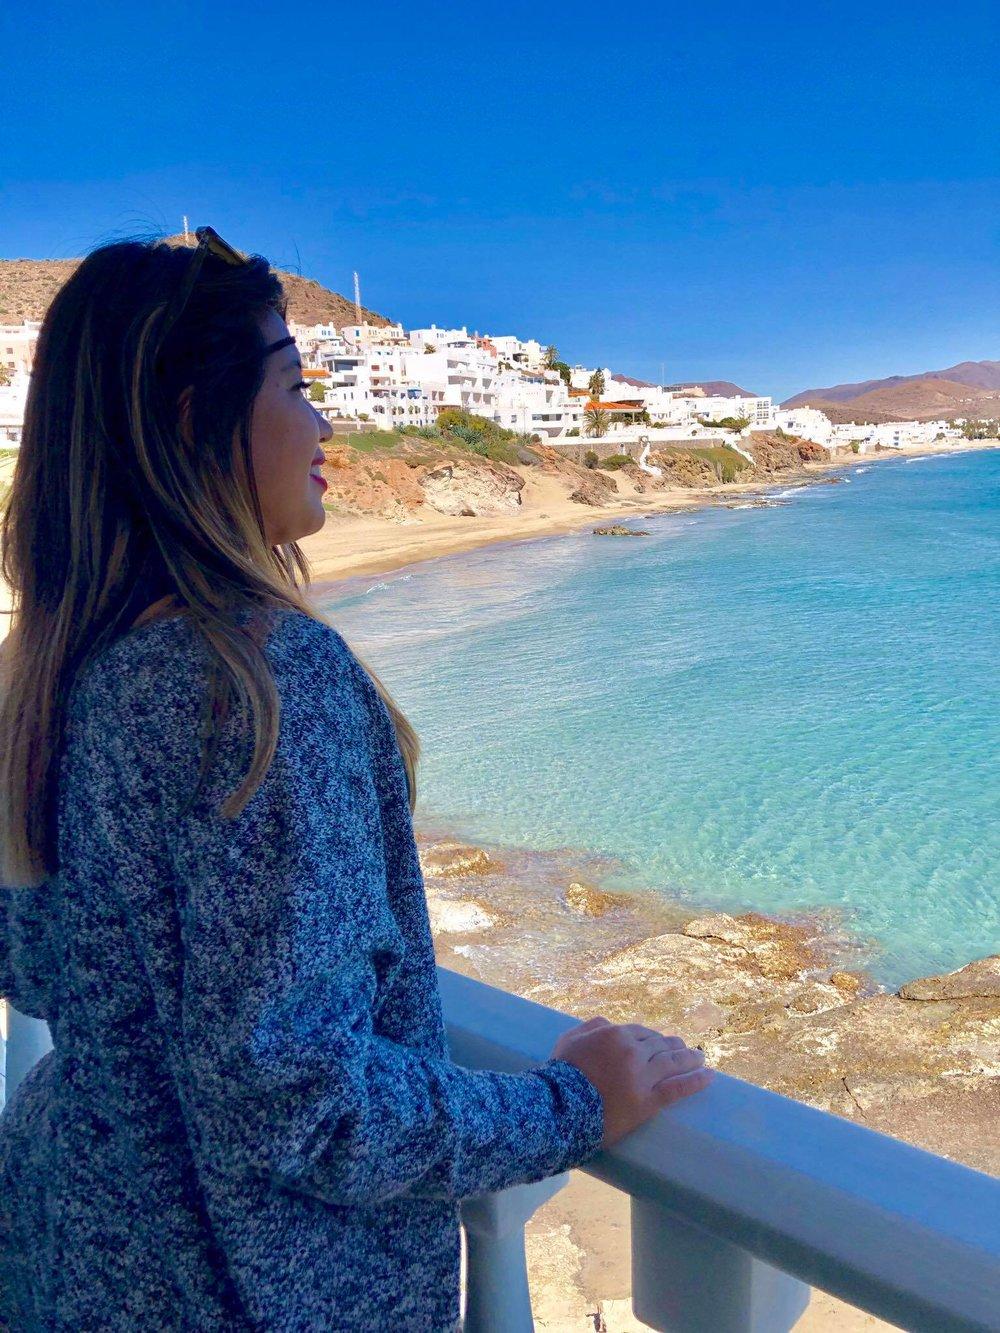 Kach Solo Travels in 2019 Spain you're so beautiful12.jpg